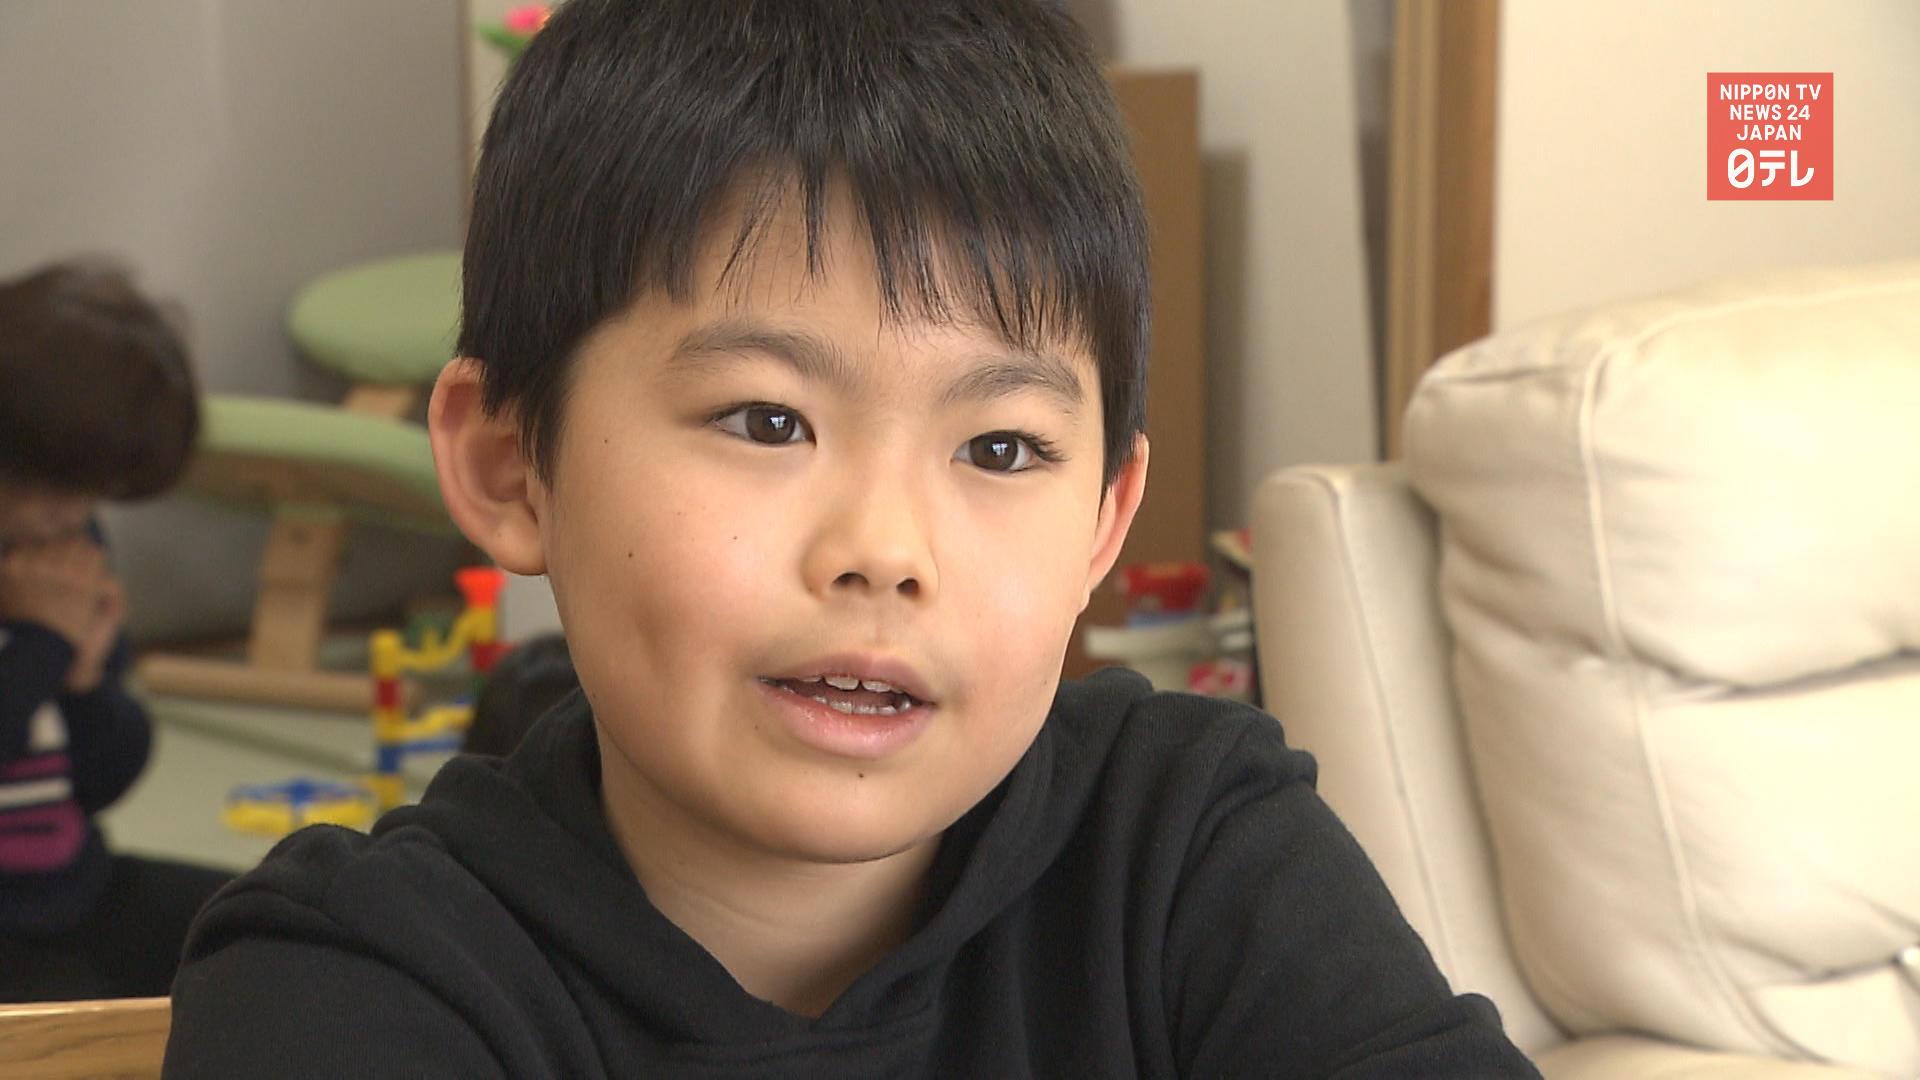 9-year-old math whiz passes top level exam